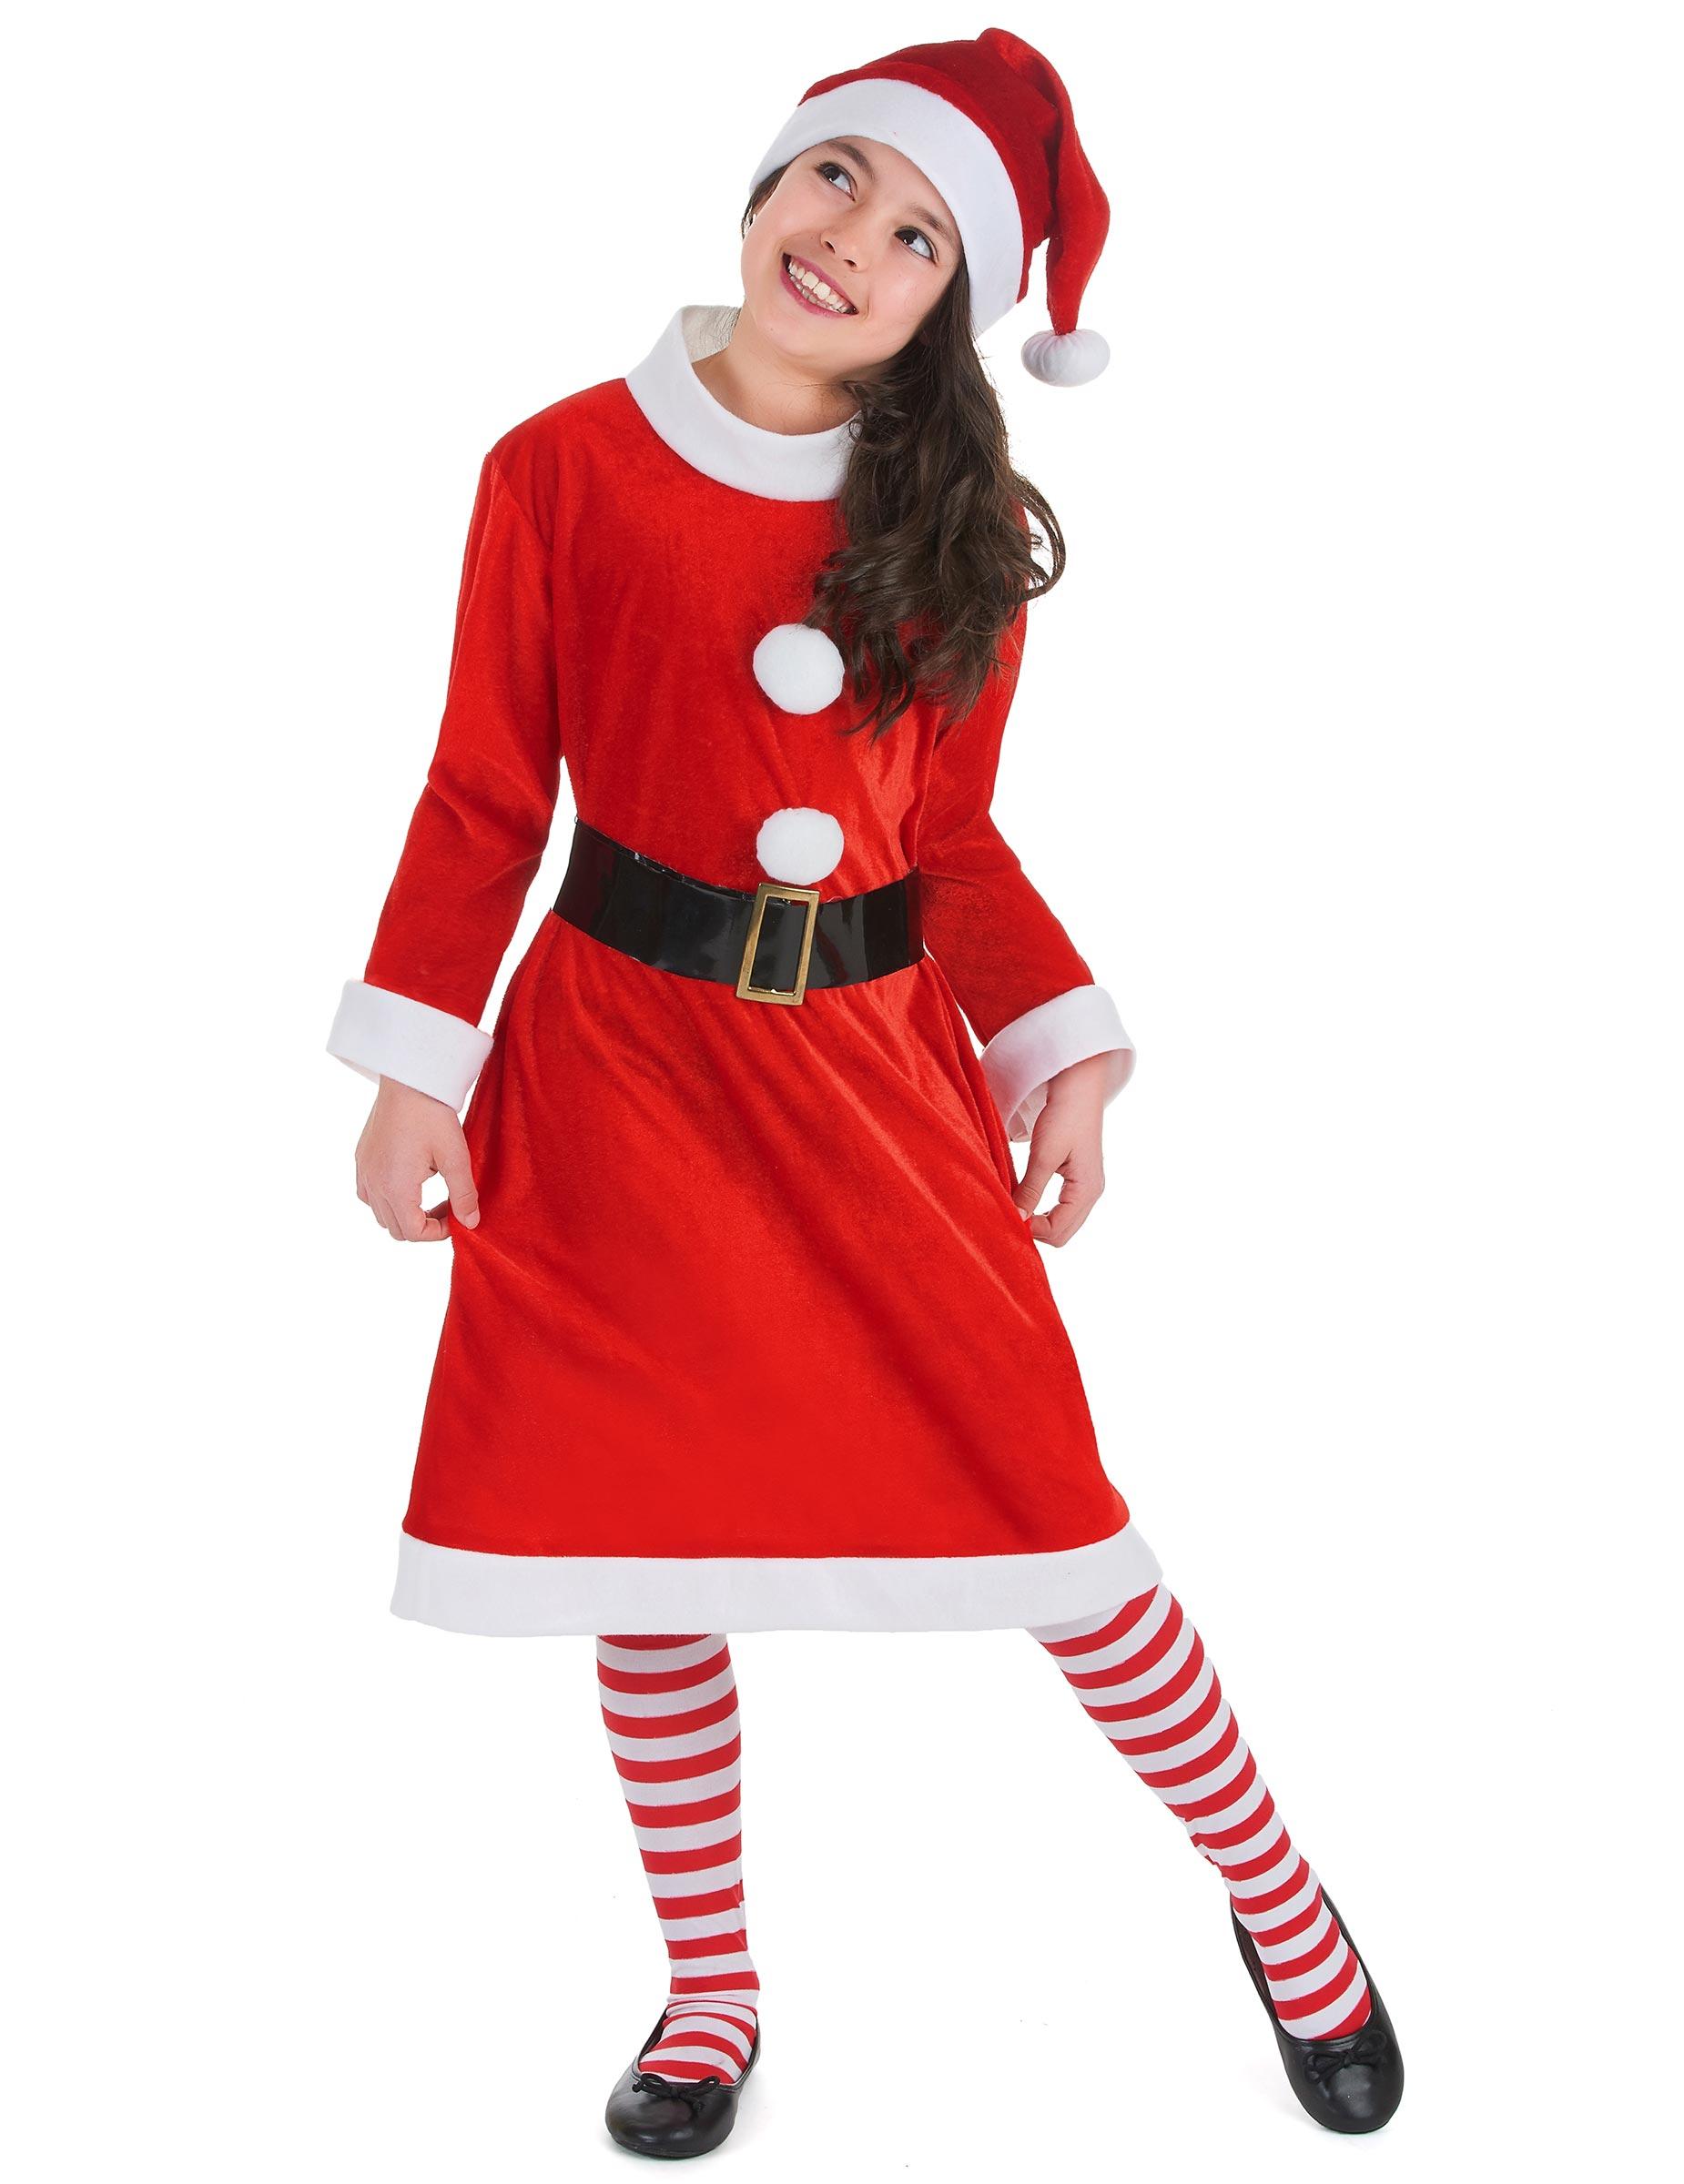 weihnachtsfrau kost m f r kinder rot weiss g nstige. Black Bedroom Furniture Sets. Home Design Ideas